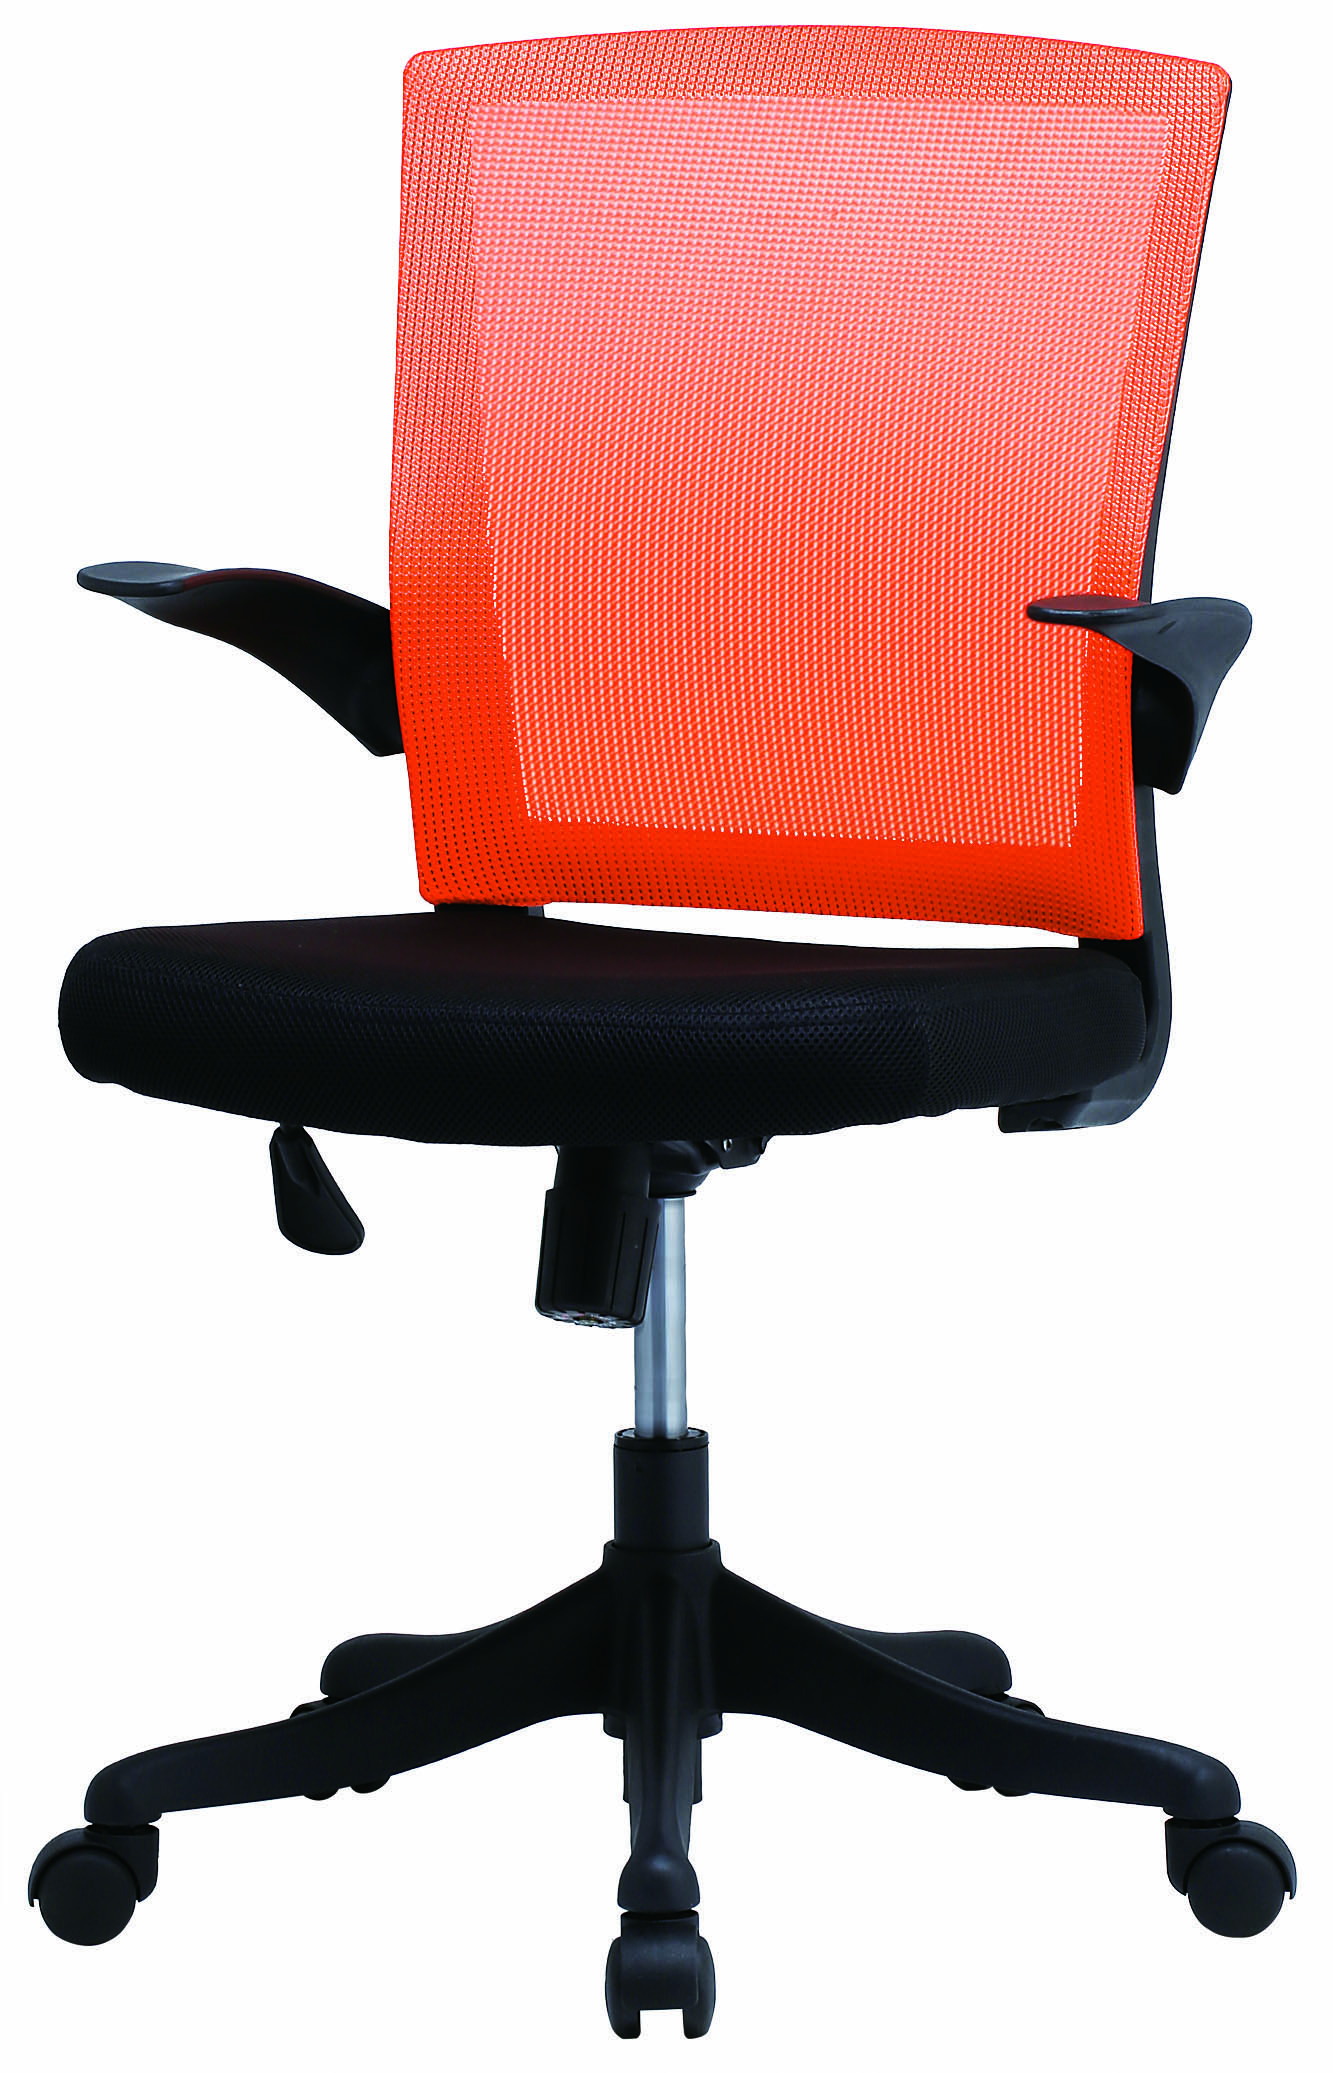 【法人様限定】【直送便】井上金庫販売回転椅子FEM-14AORオレンジ